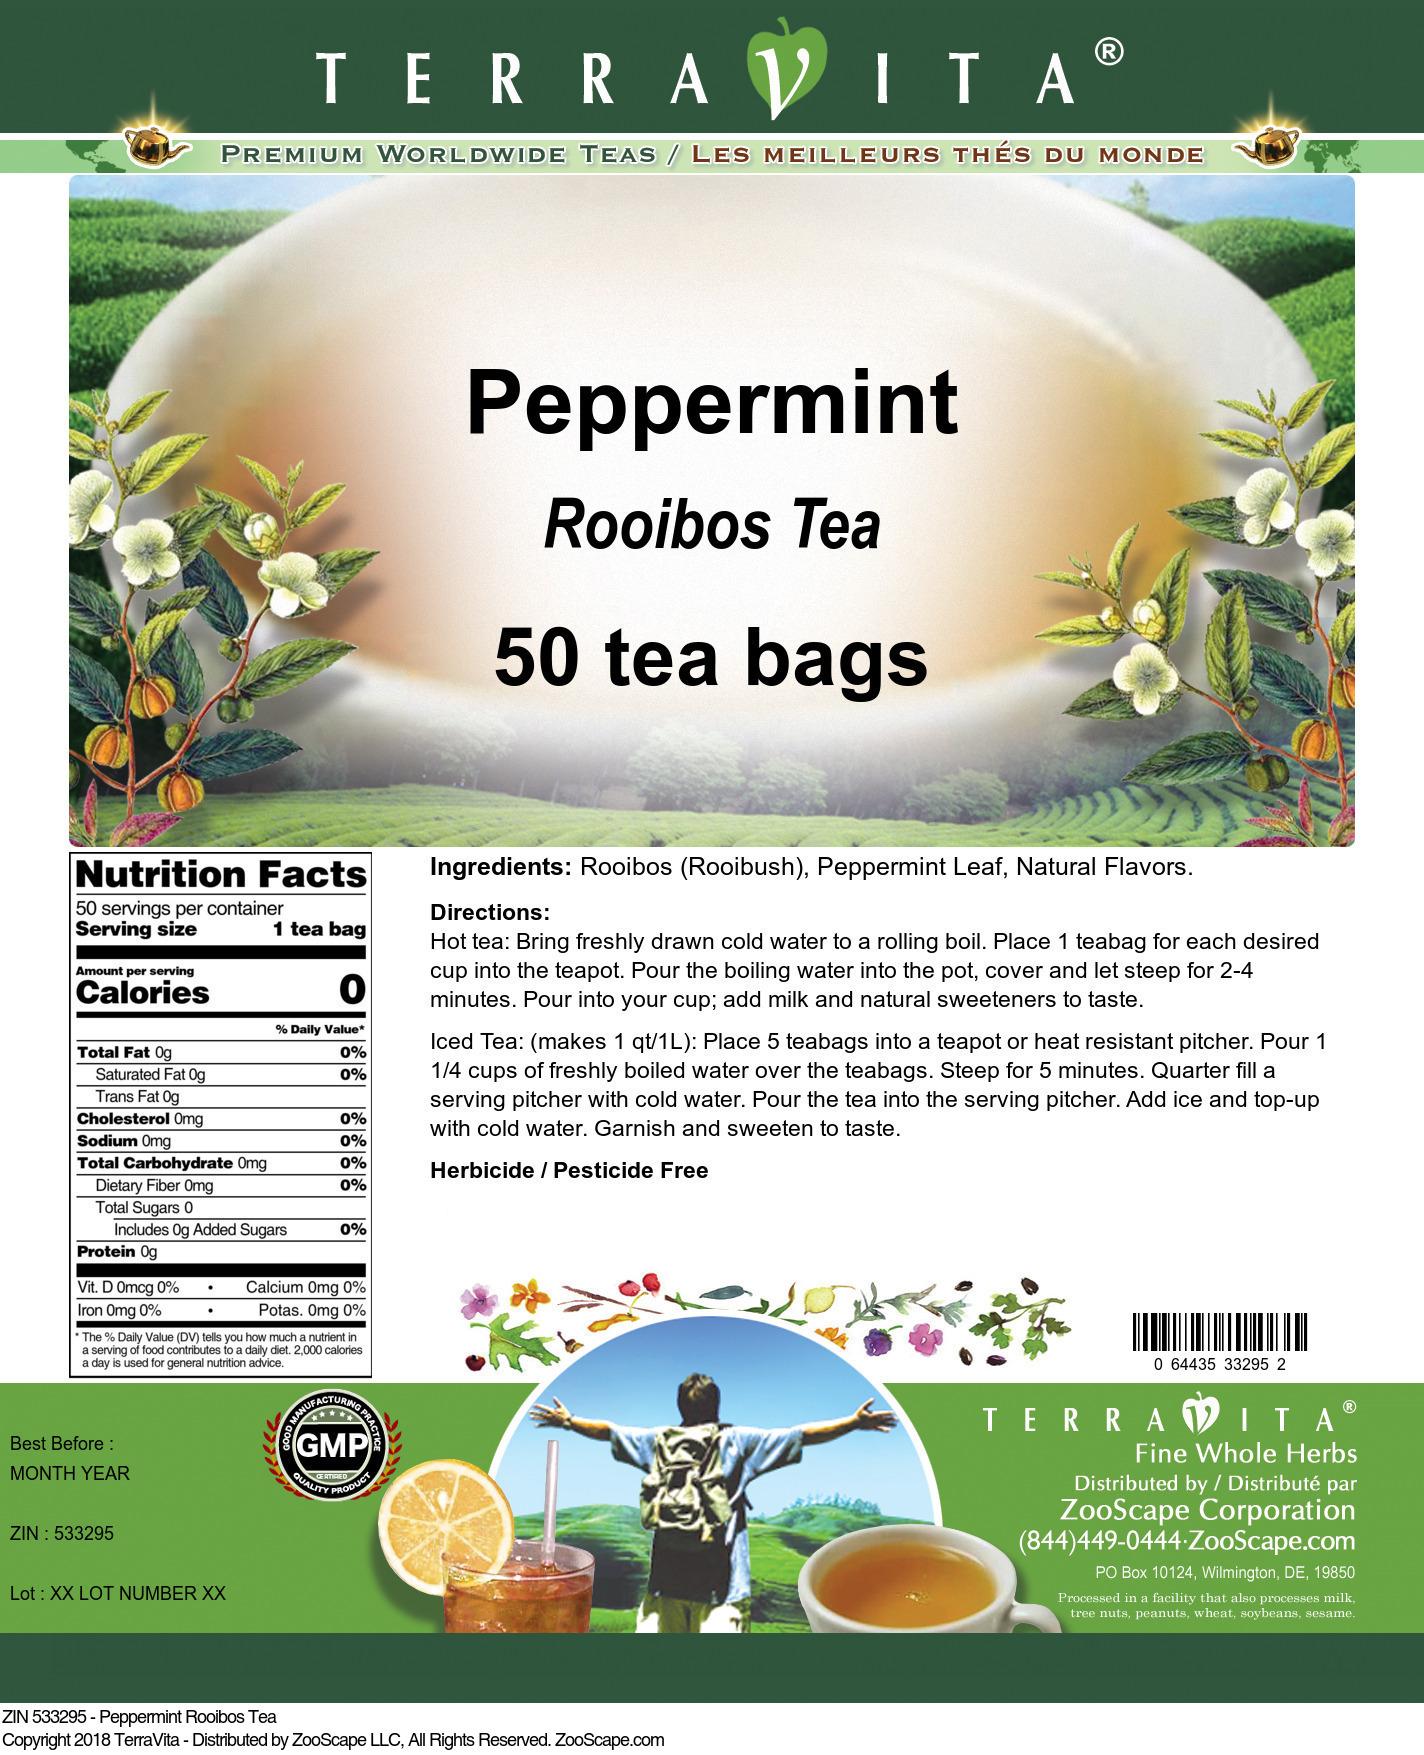 Peppermint Rooibos Tea